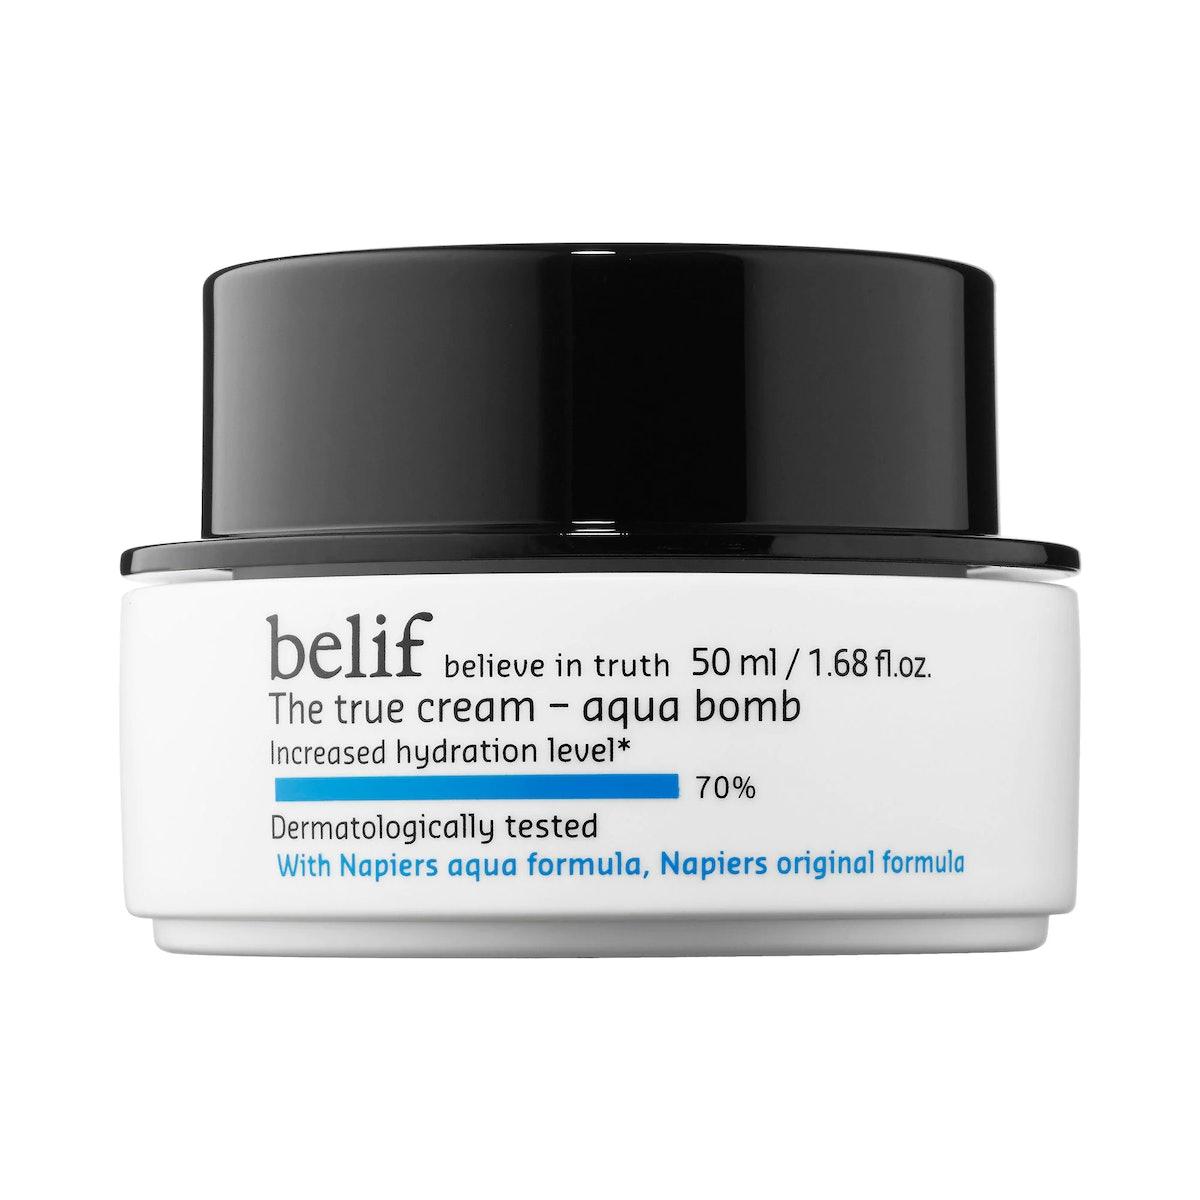 belif The True Cream Aqua Bomb, 1.68 oz